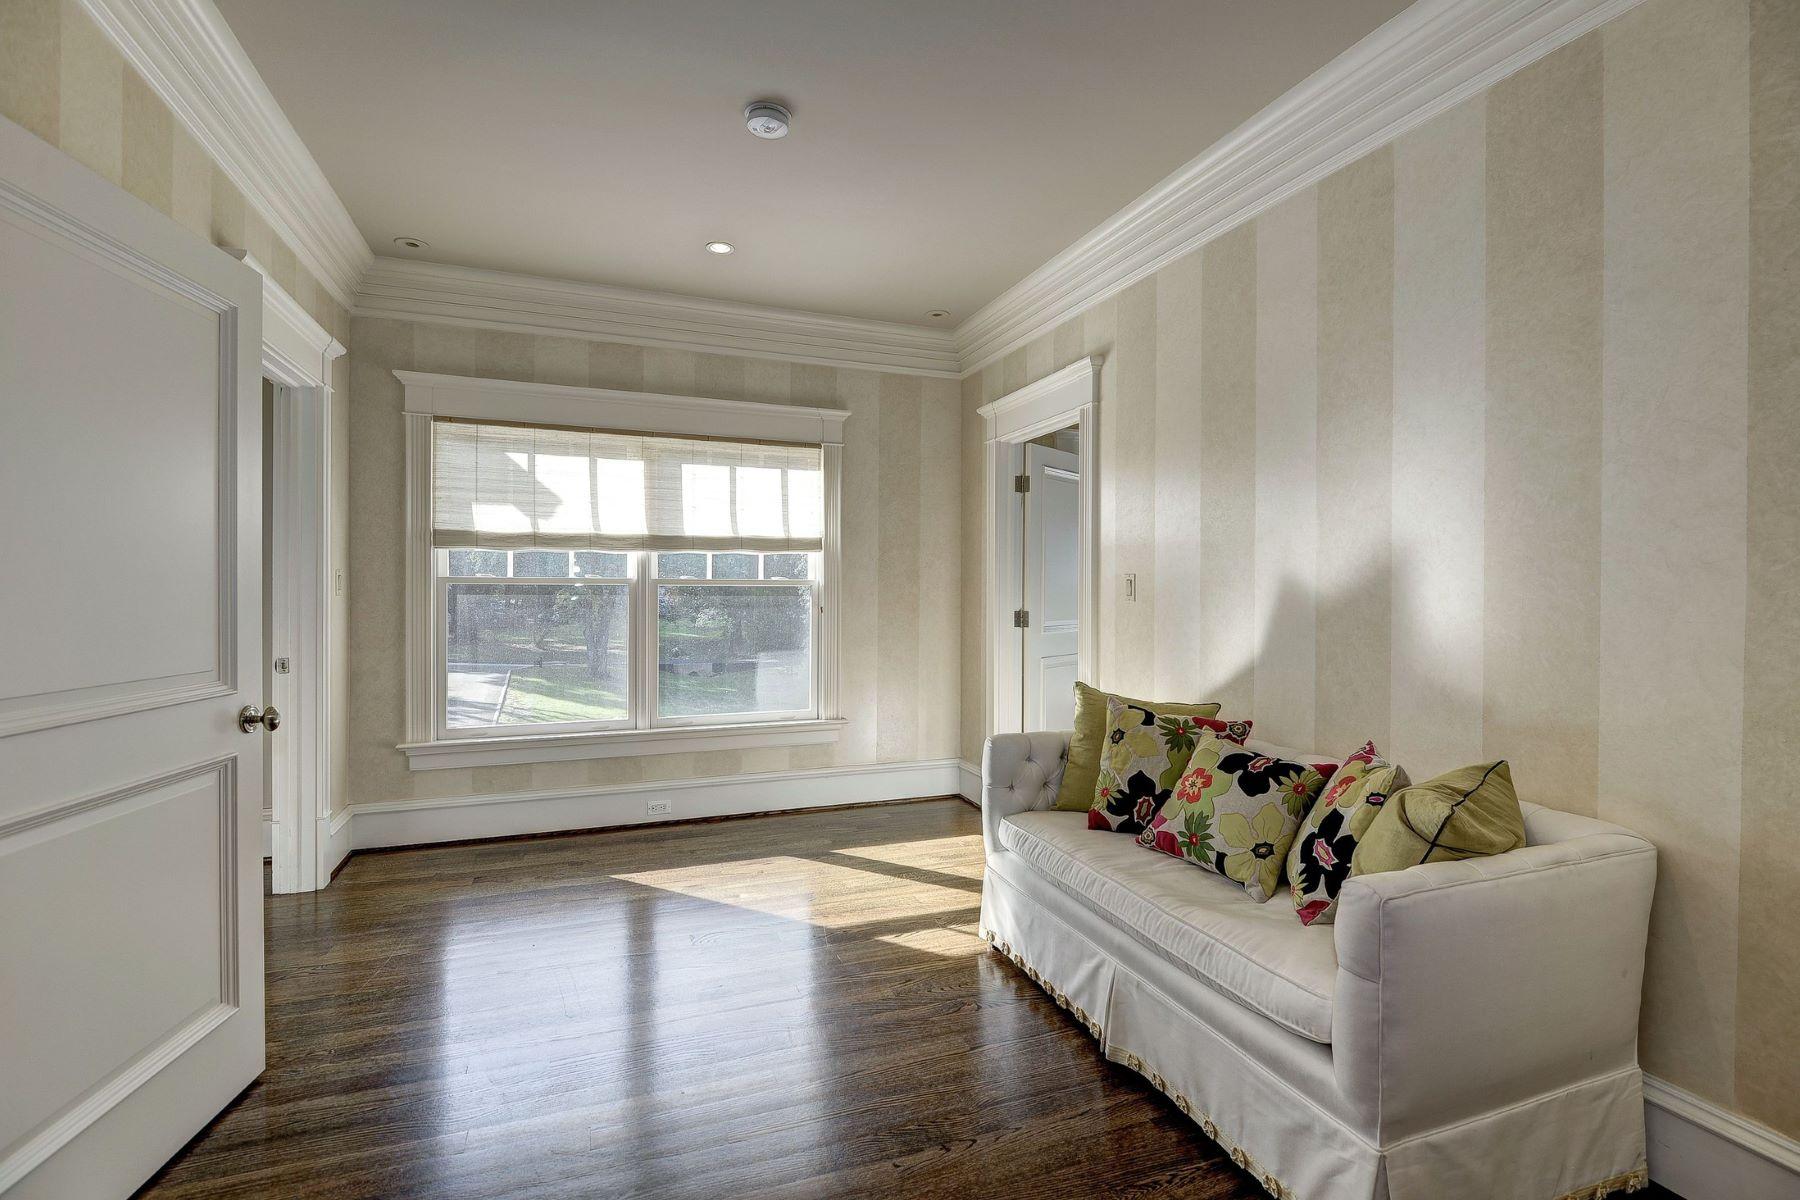 Additional photo for property listing at 833 Herbert Springs Road, Alexandria 833 Herbert Springs Rd Alexandria, Virginia 22308 United States